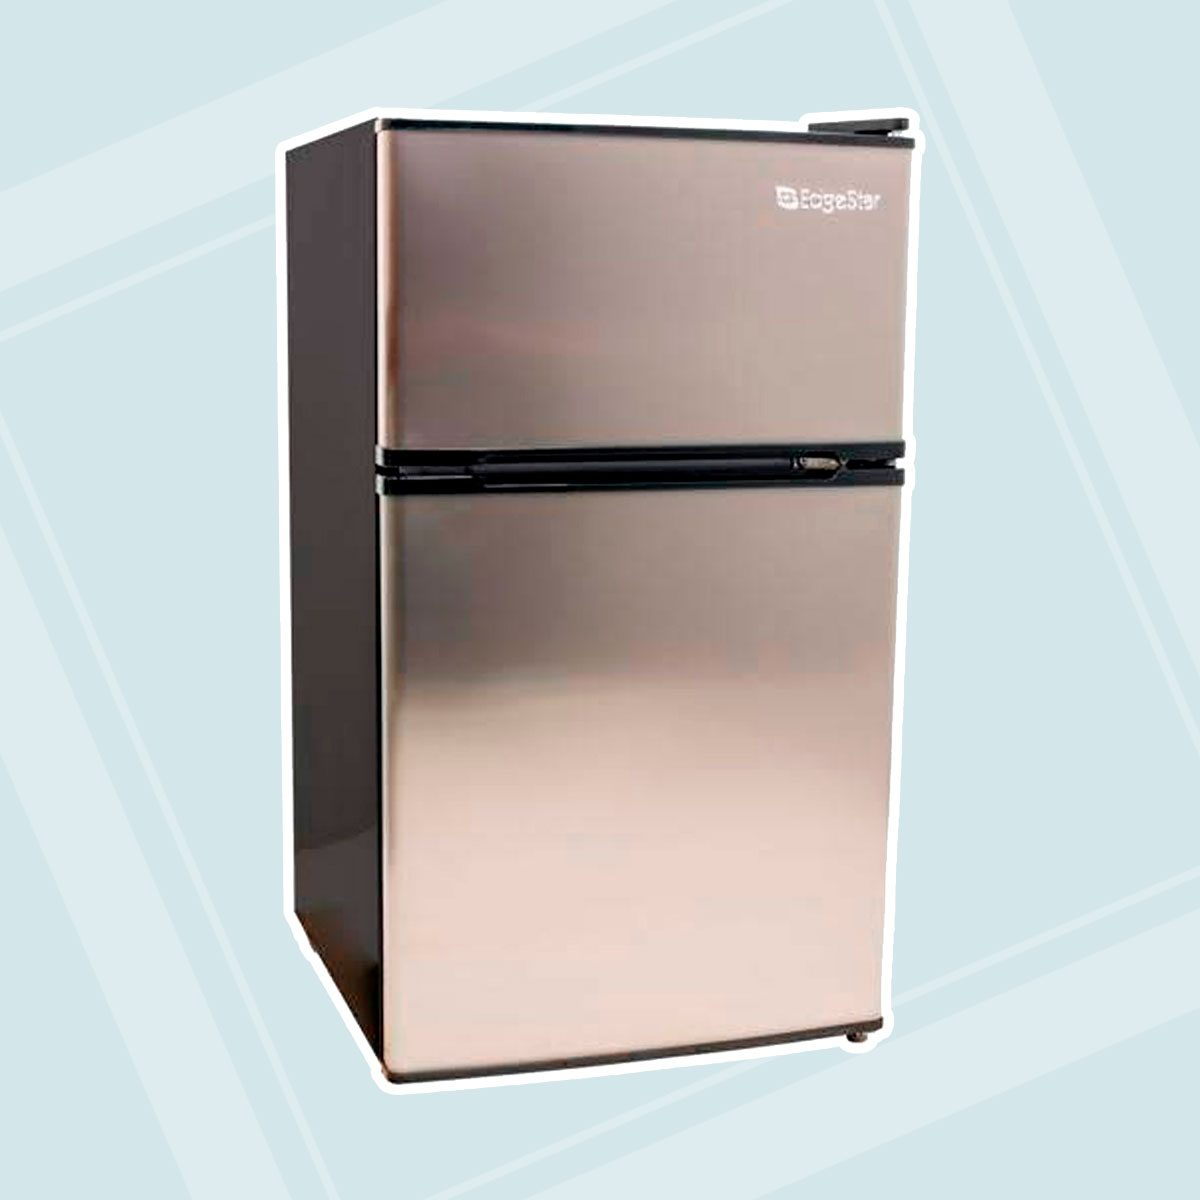 EdgeStar 3.1 Cu. Ft. Dorm-Sized Fridge/Freezer